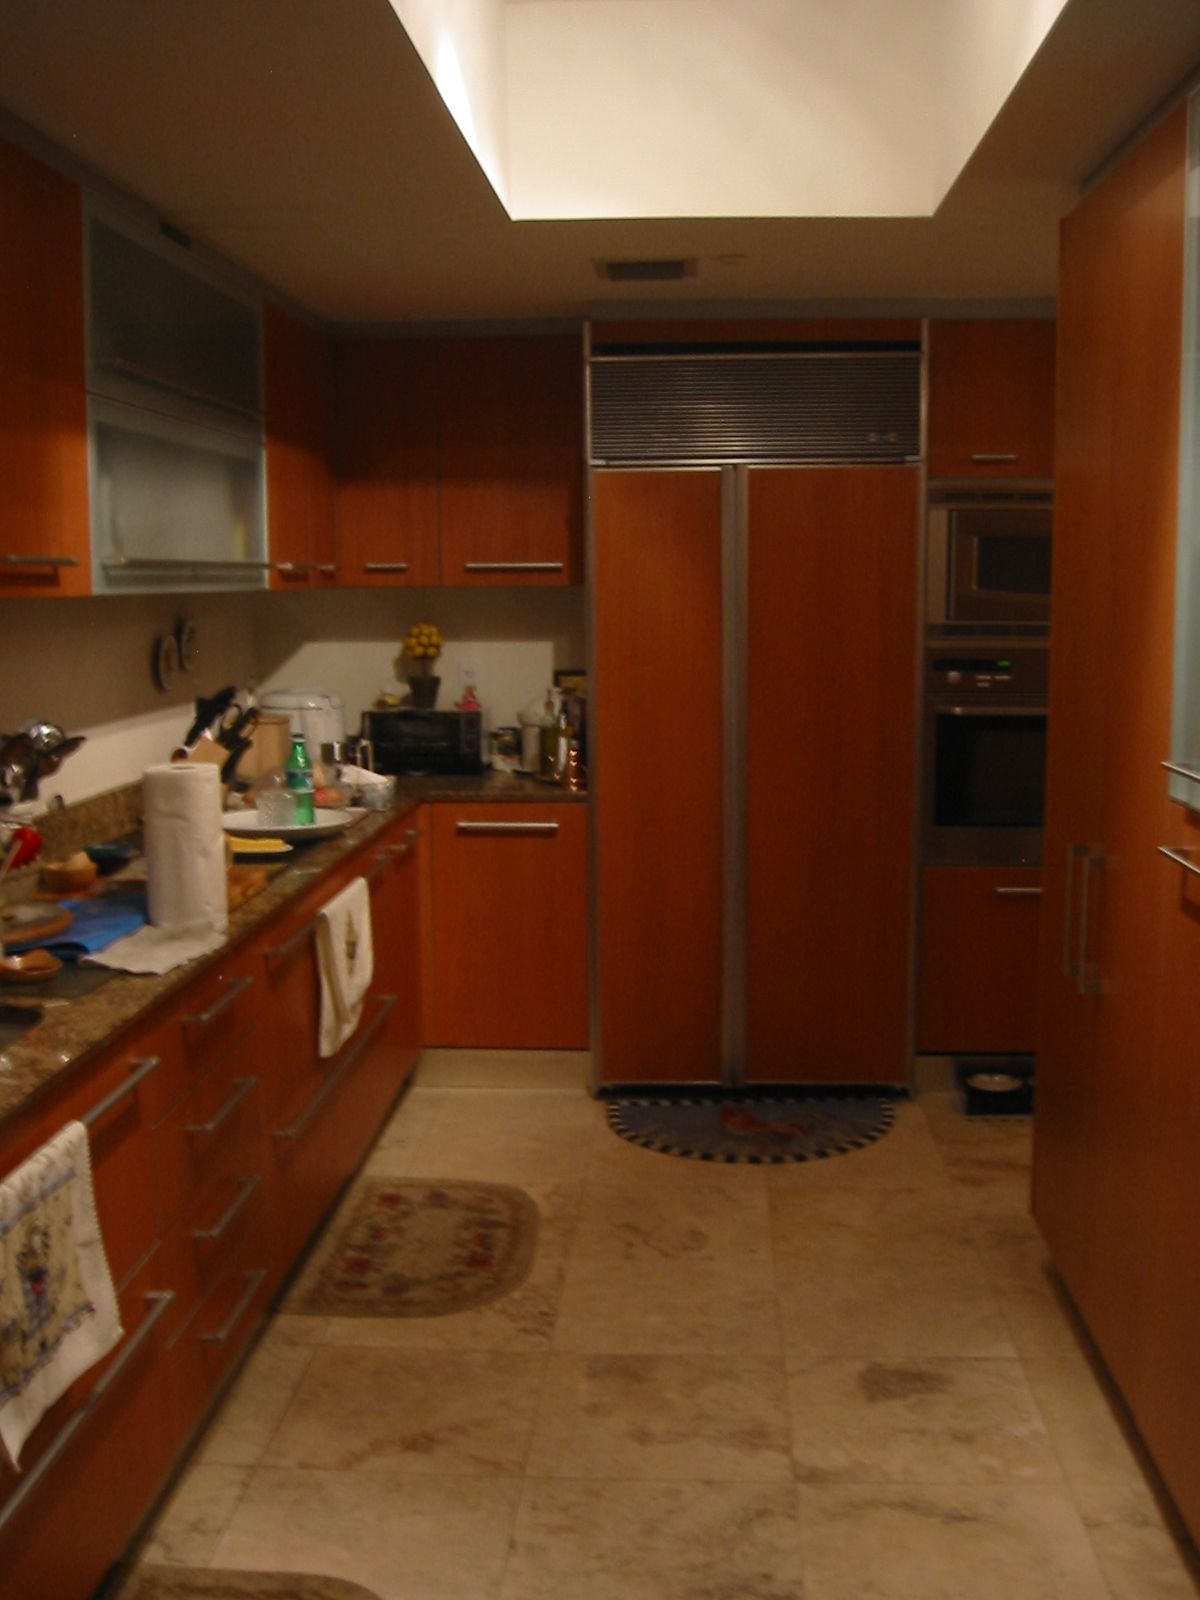 Kitchens-167.jpg